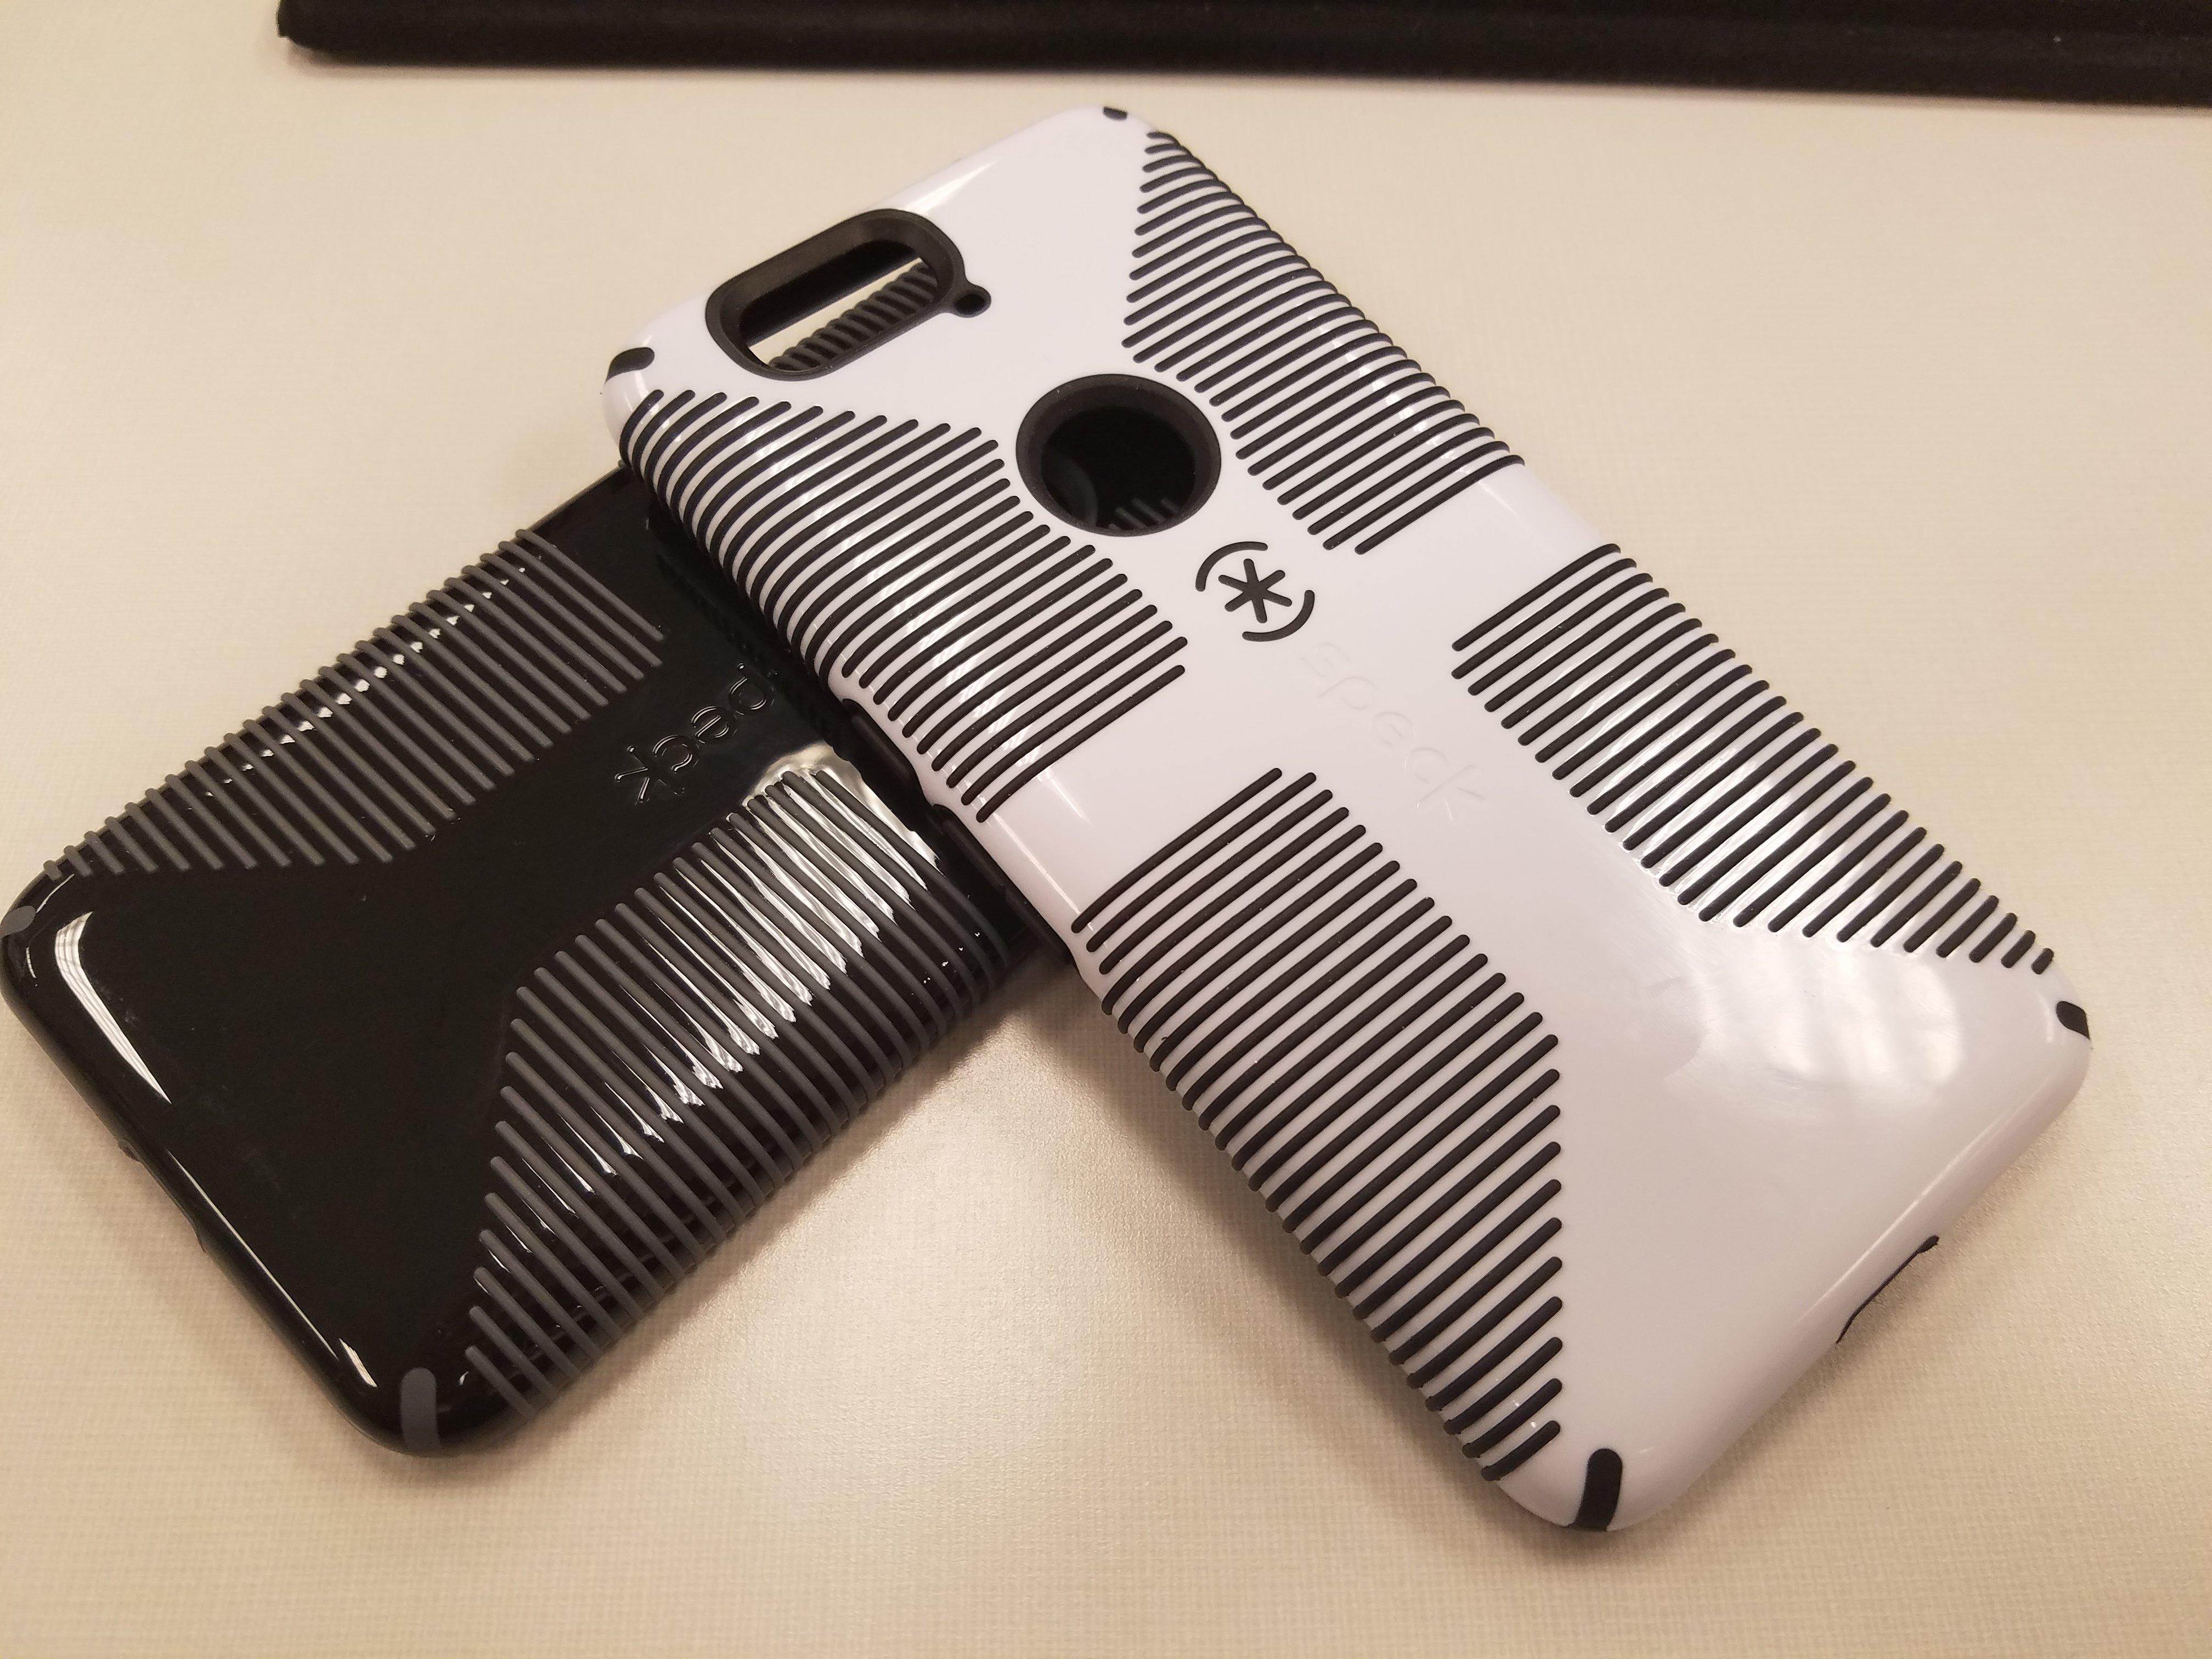 Speck Nexus 6P featured